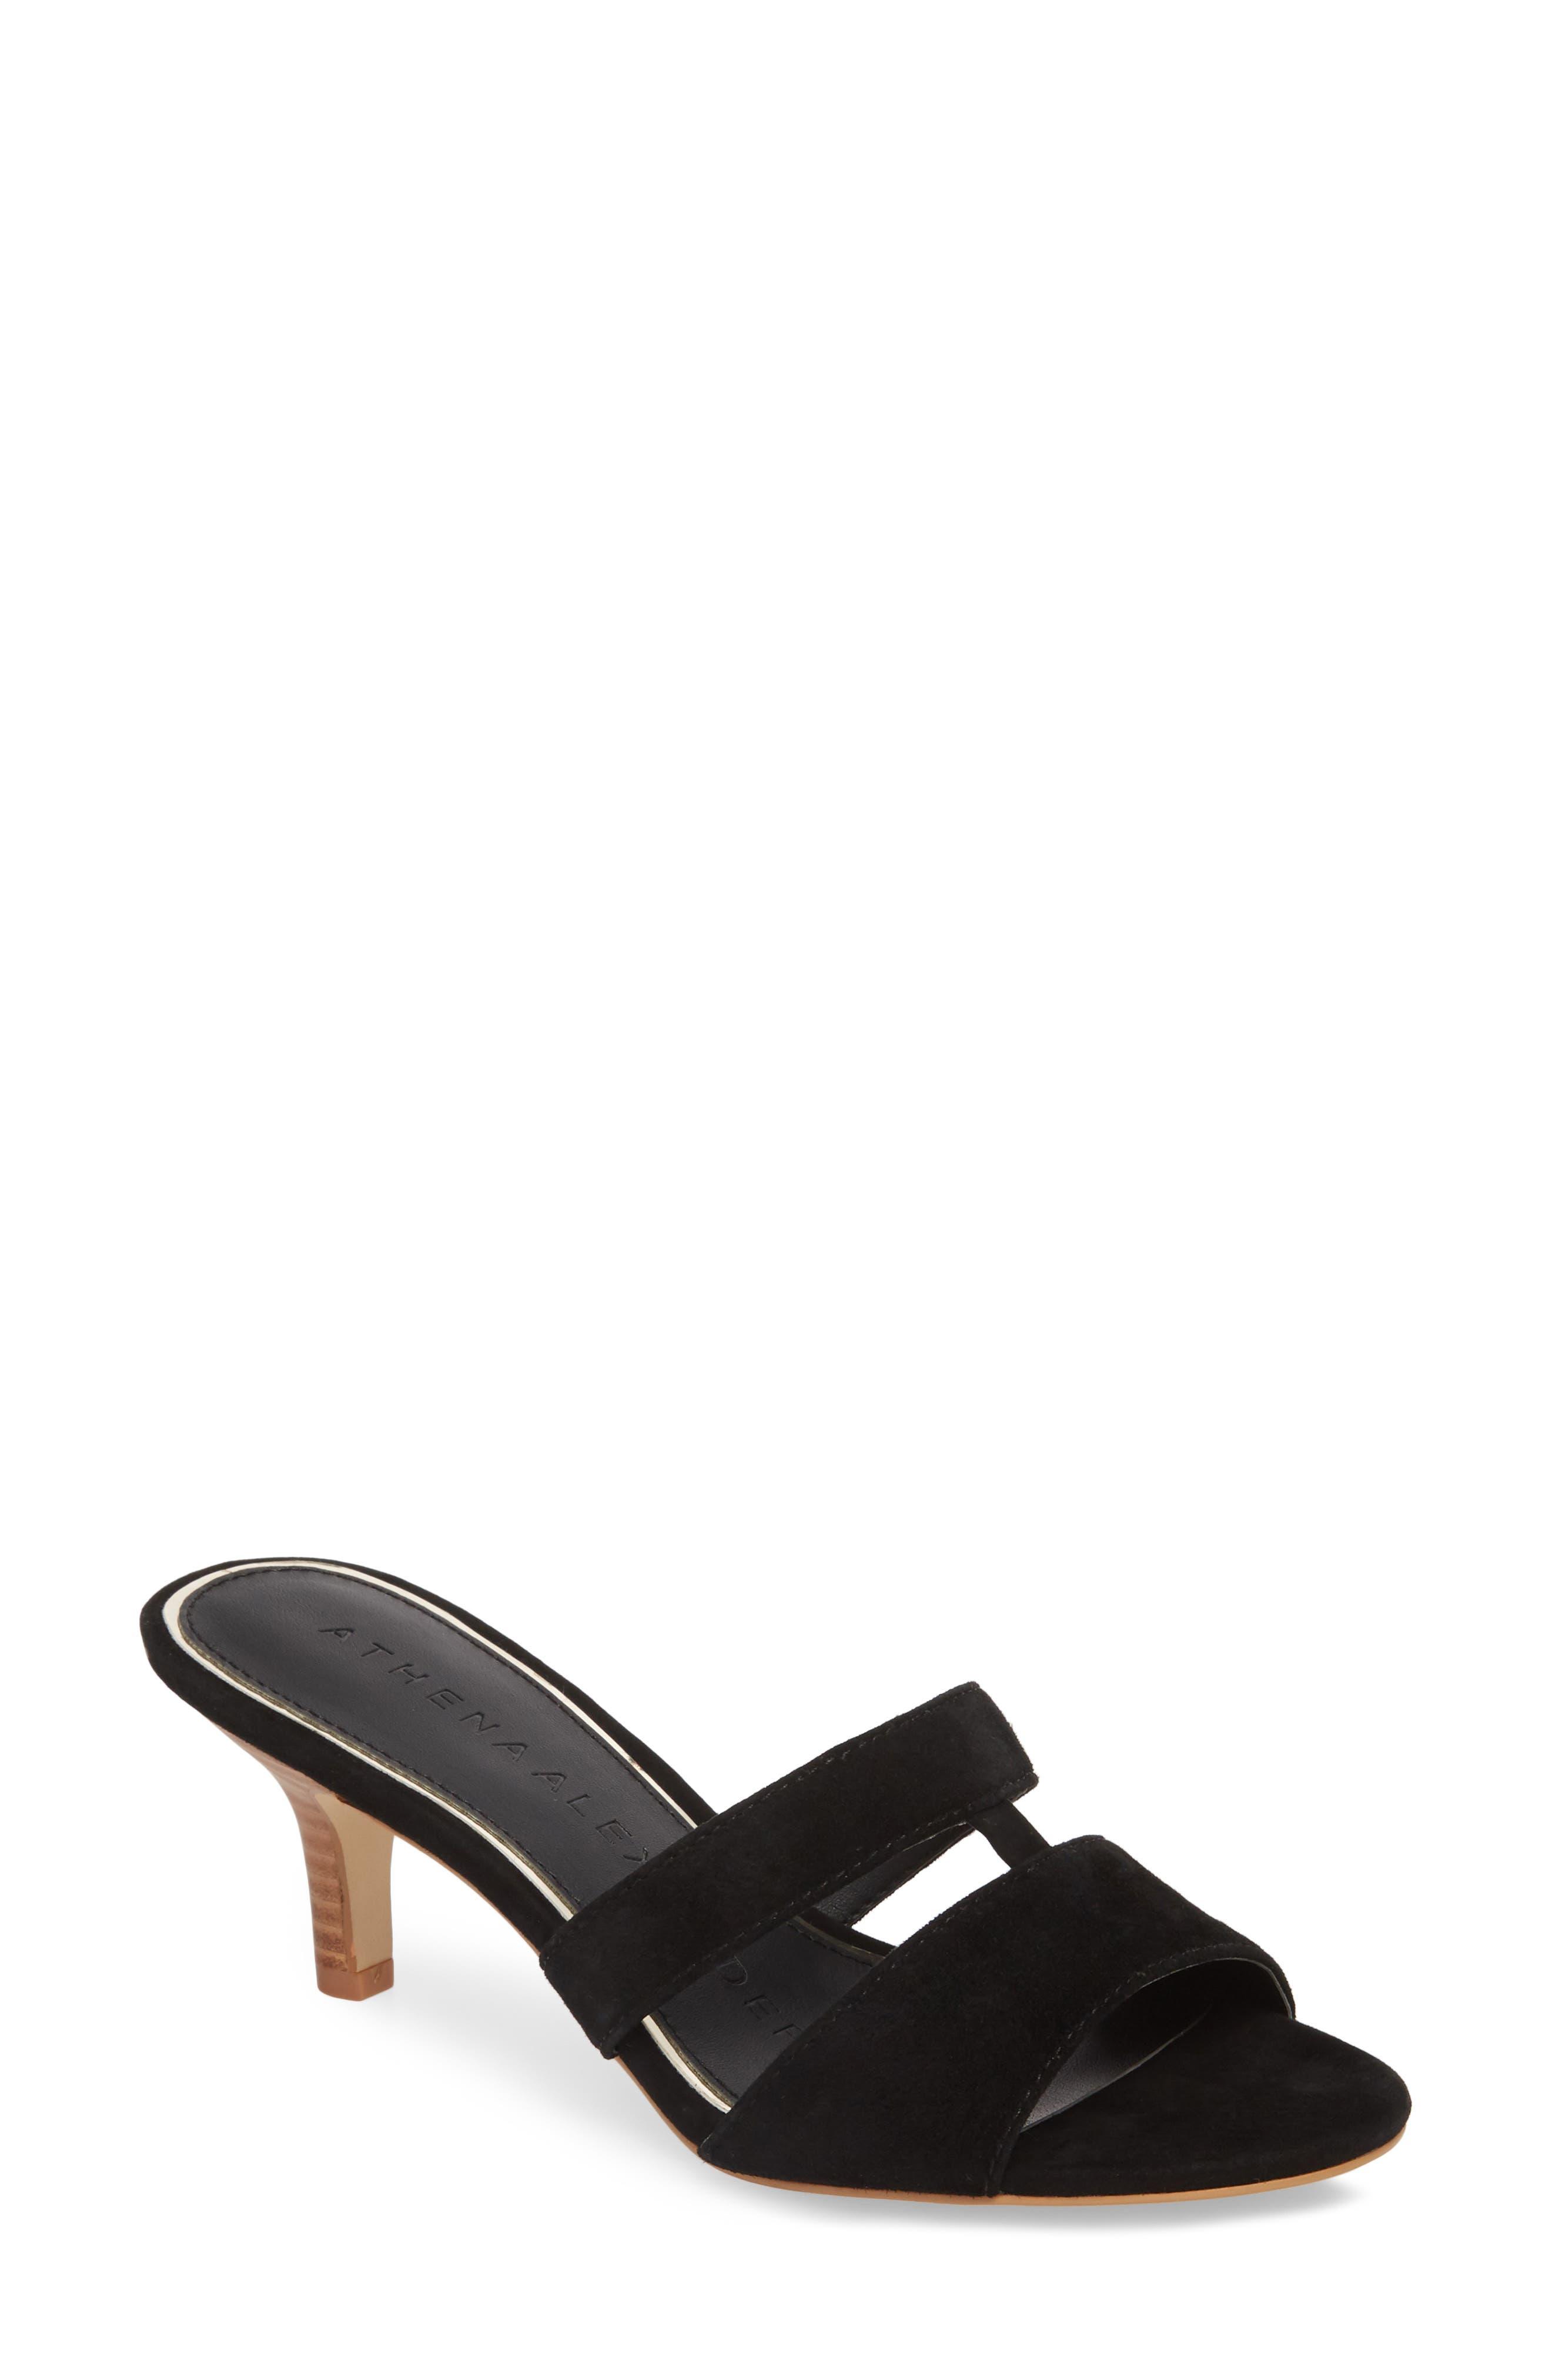 Womens Athena Alexander Amore Sandals Black TSL30539